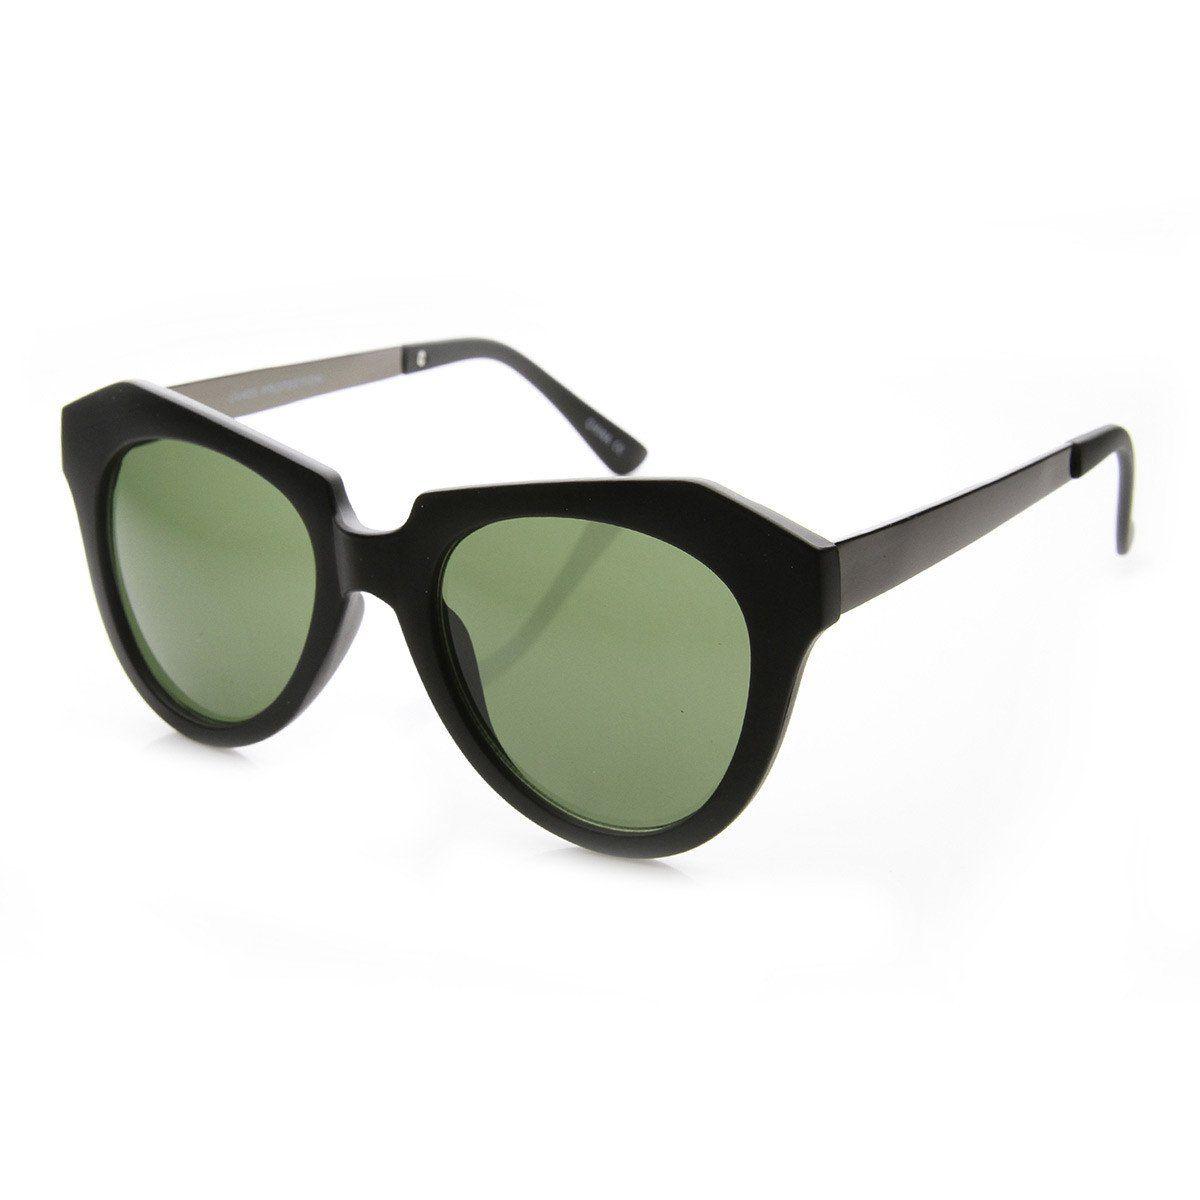 Modern Thick Cat Eye / Horn Rimmed Cross Sunglasses Edgy Retro Style Eyewear